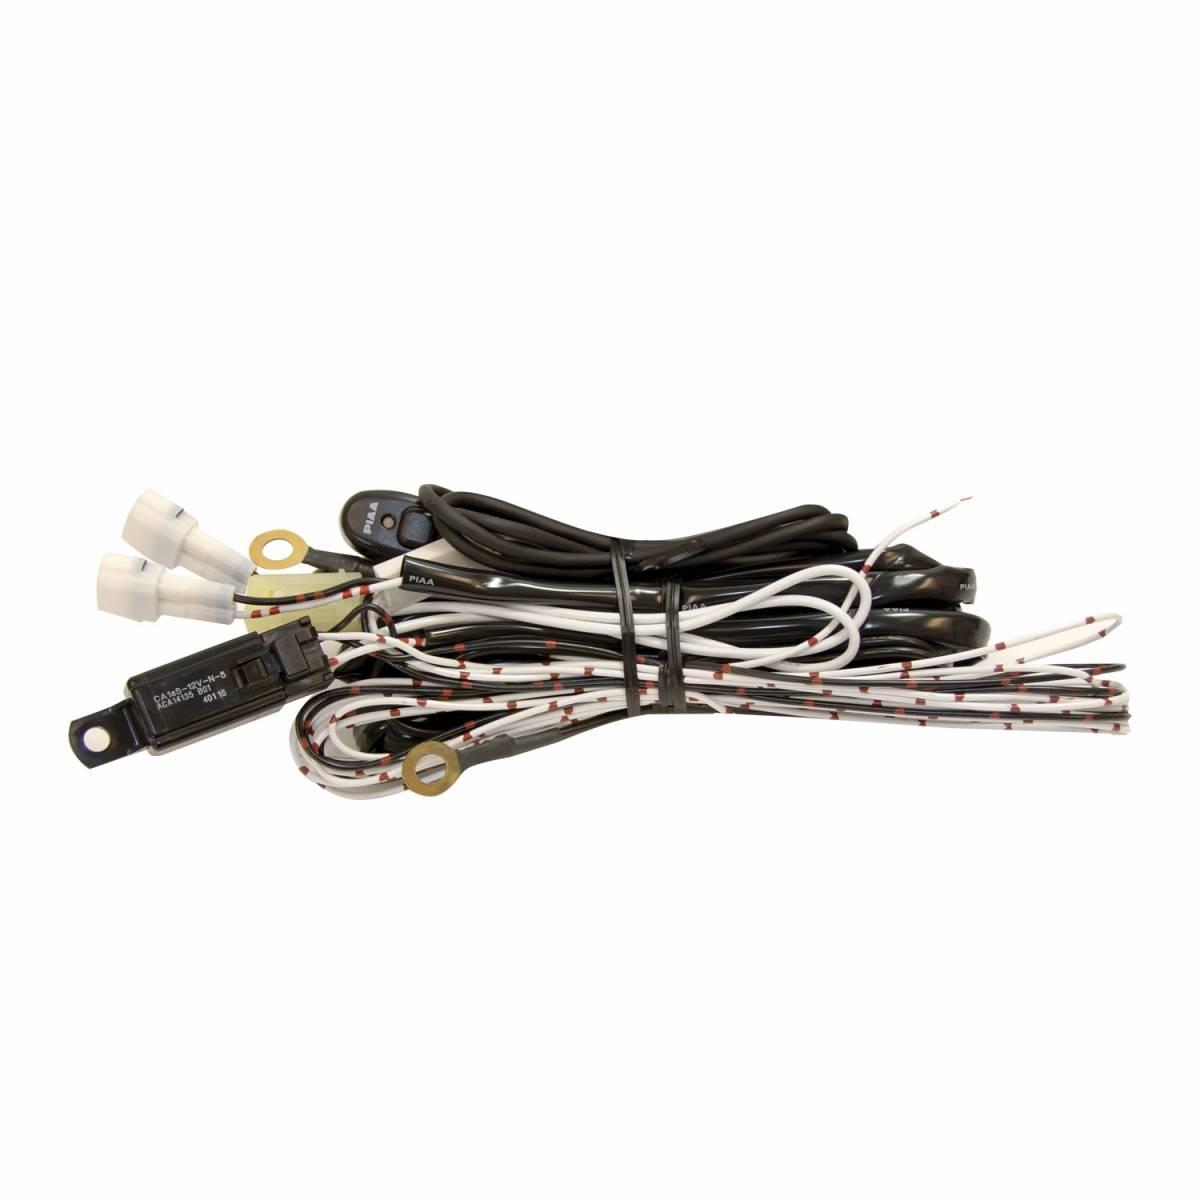 hight resolution of piaa piaa wiring harness 34071